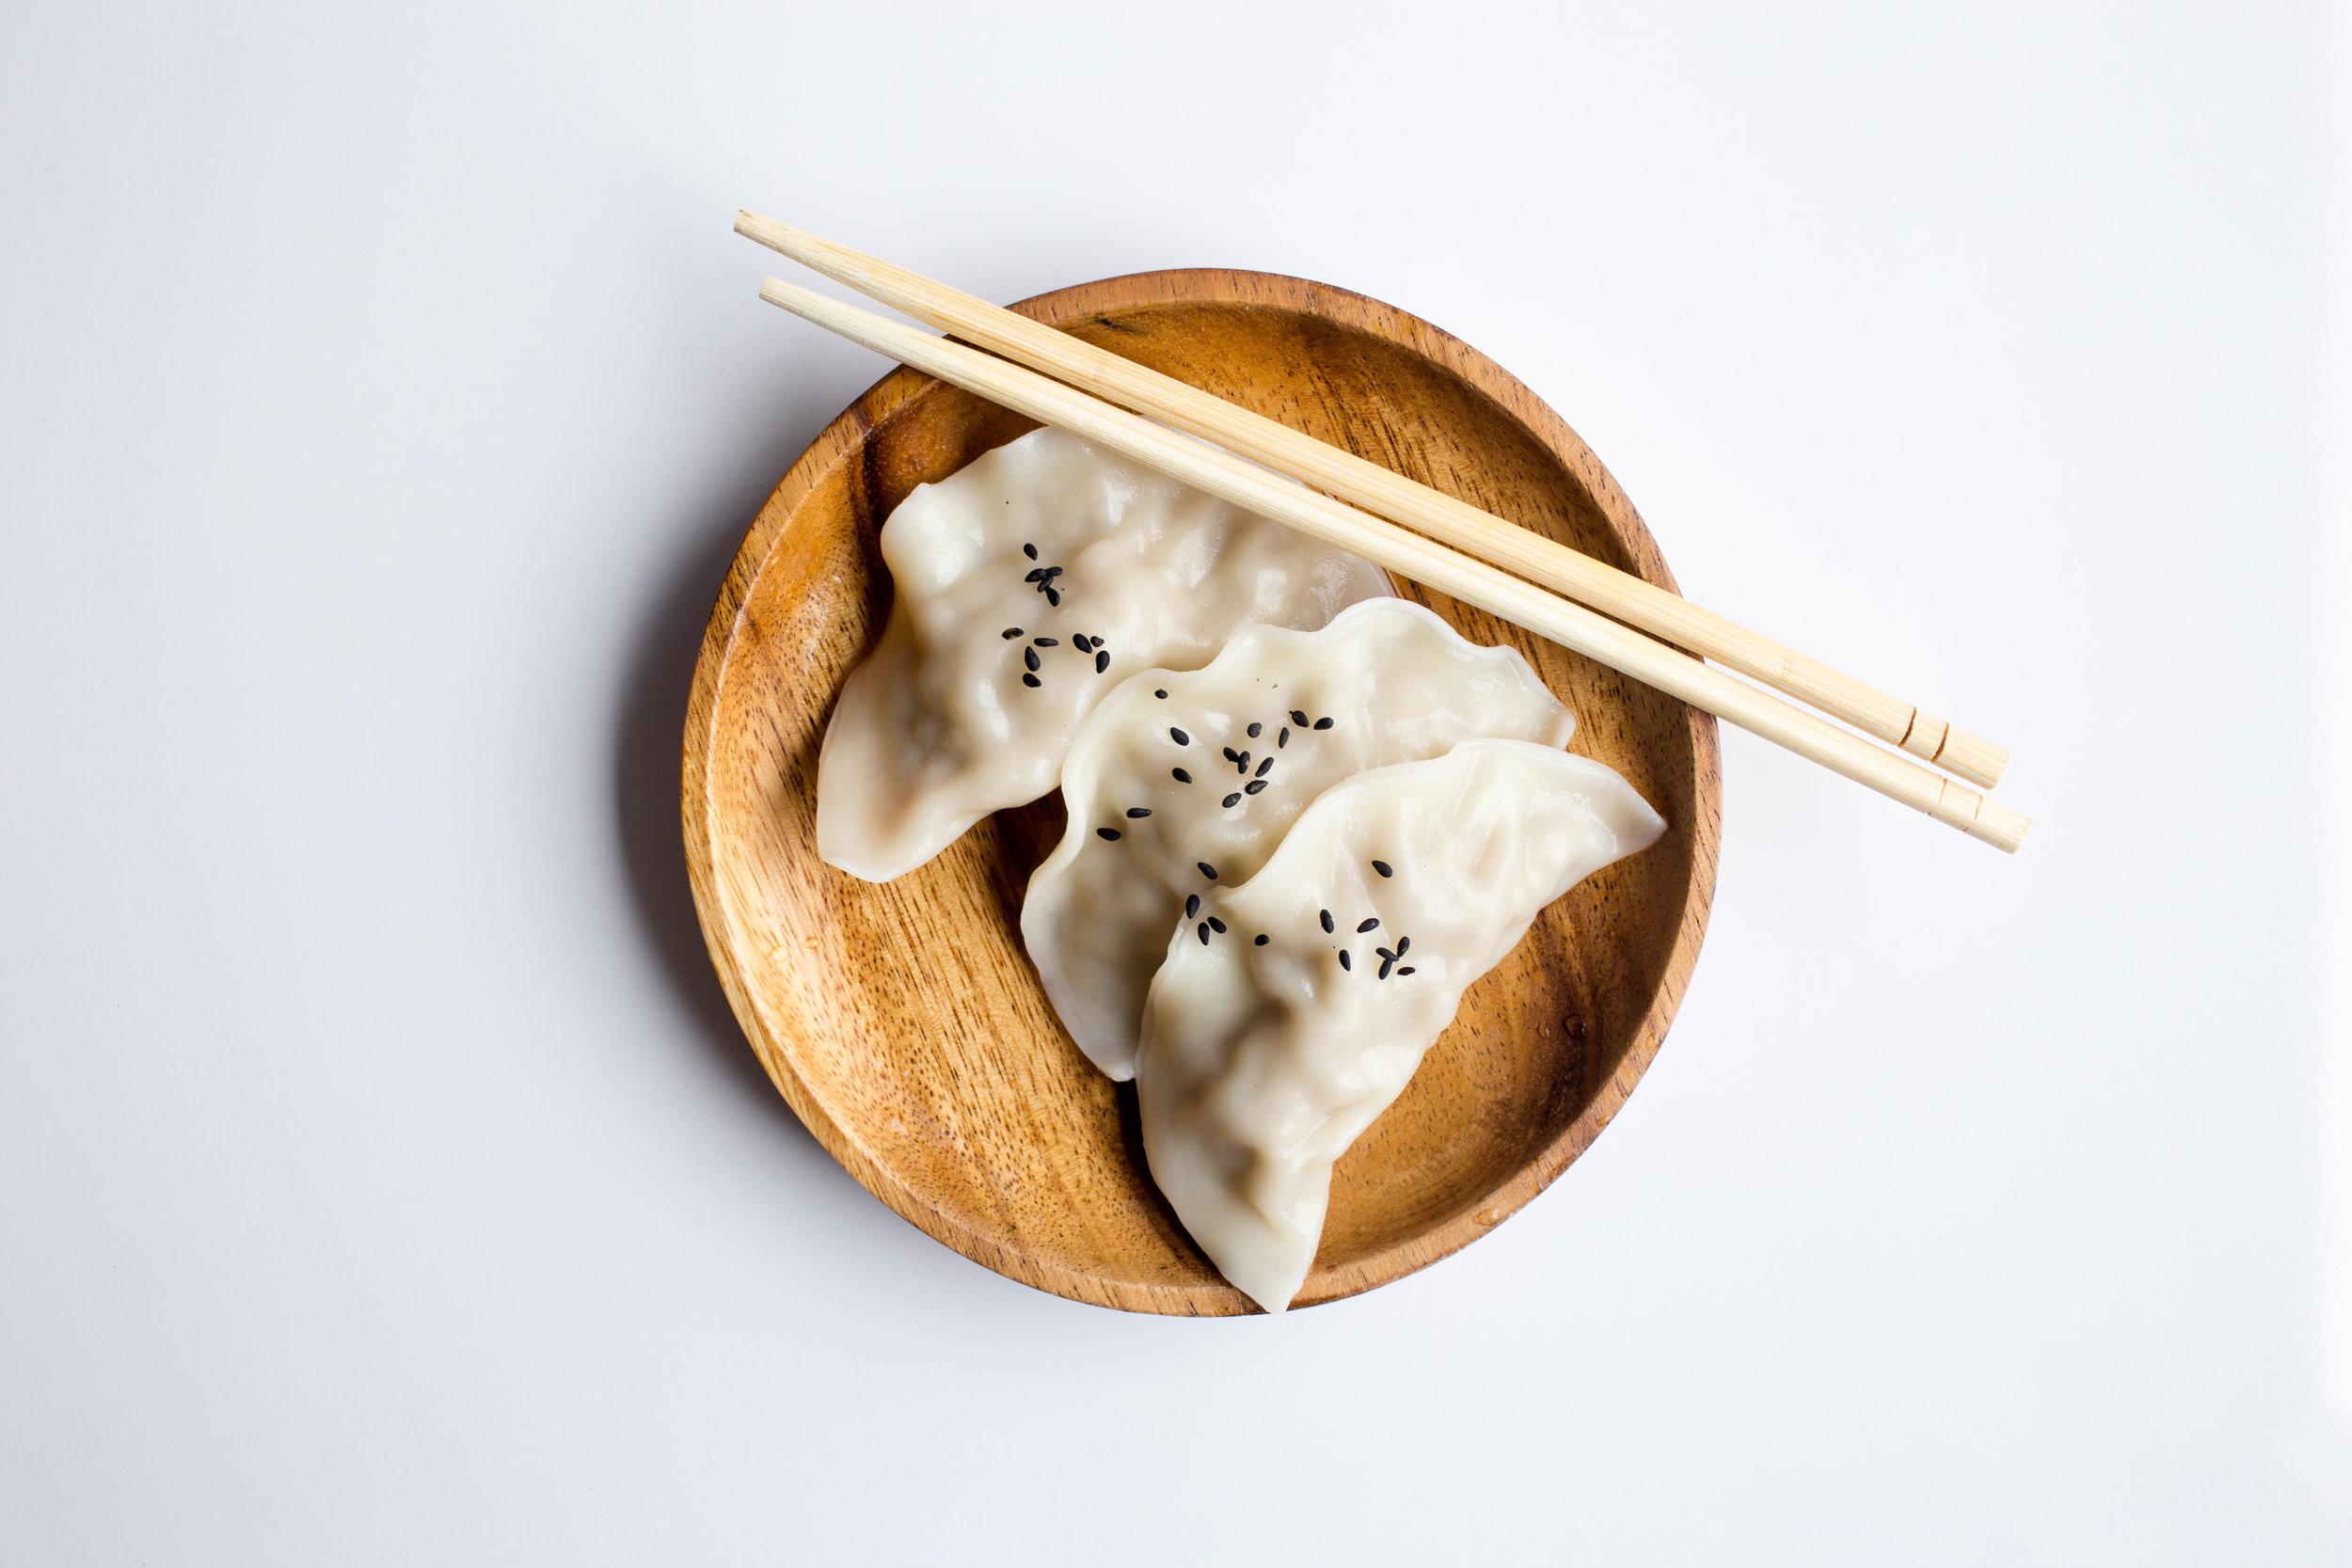 Food Photography - Plain